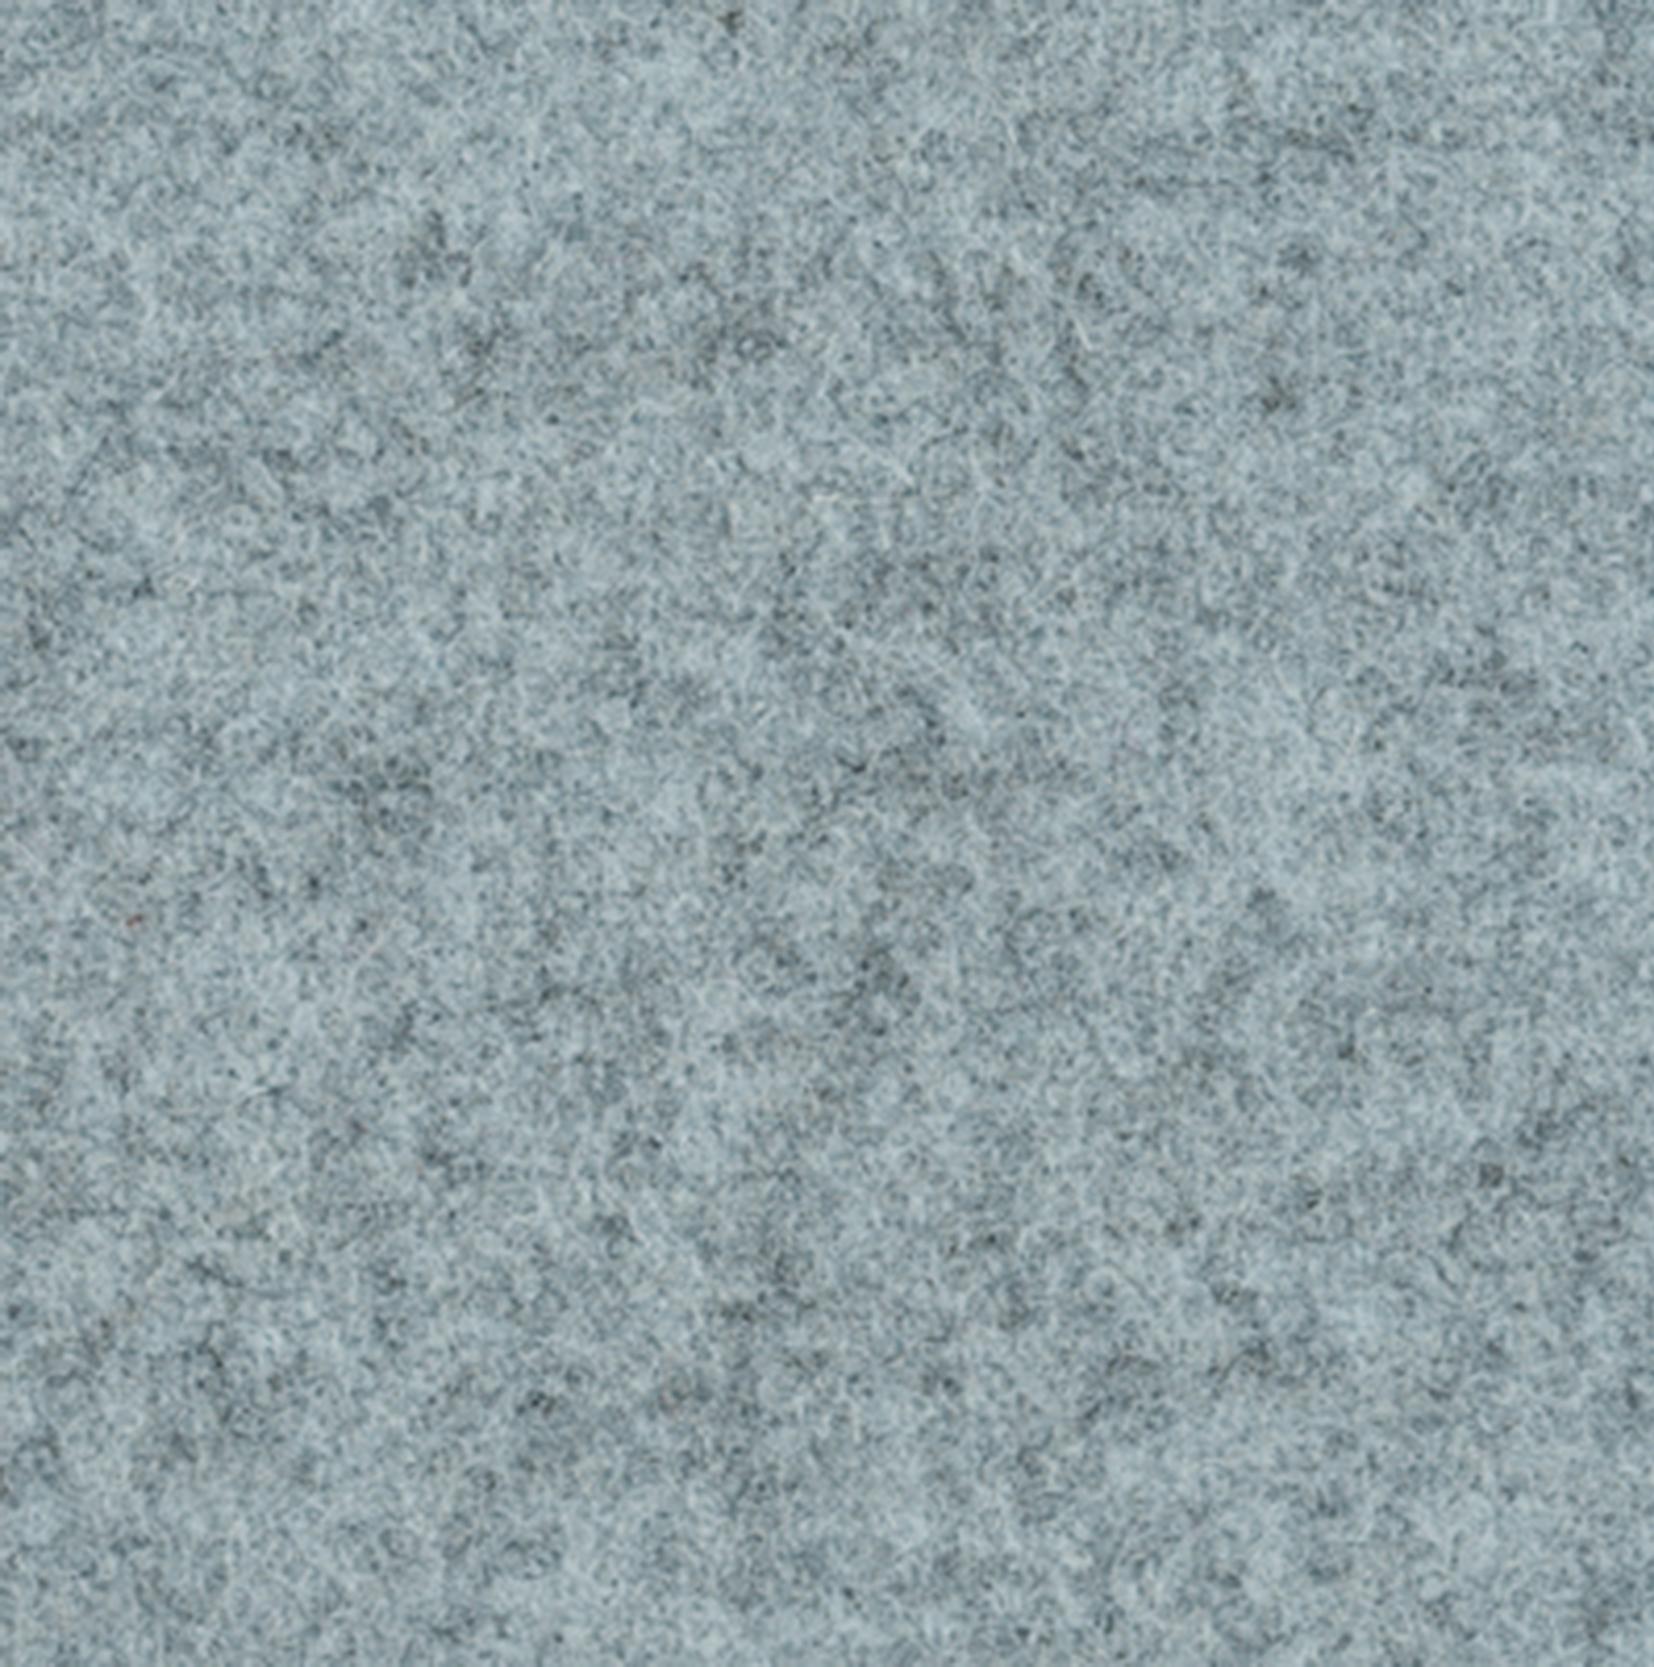 CAMIRA BLAZER WOOL - SMOKE BLUE (Plymouth - CUZ1R) [+C$70.08]